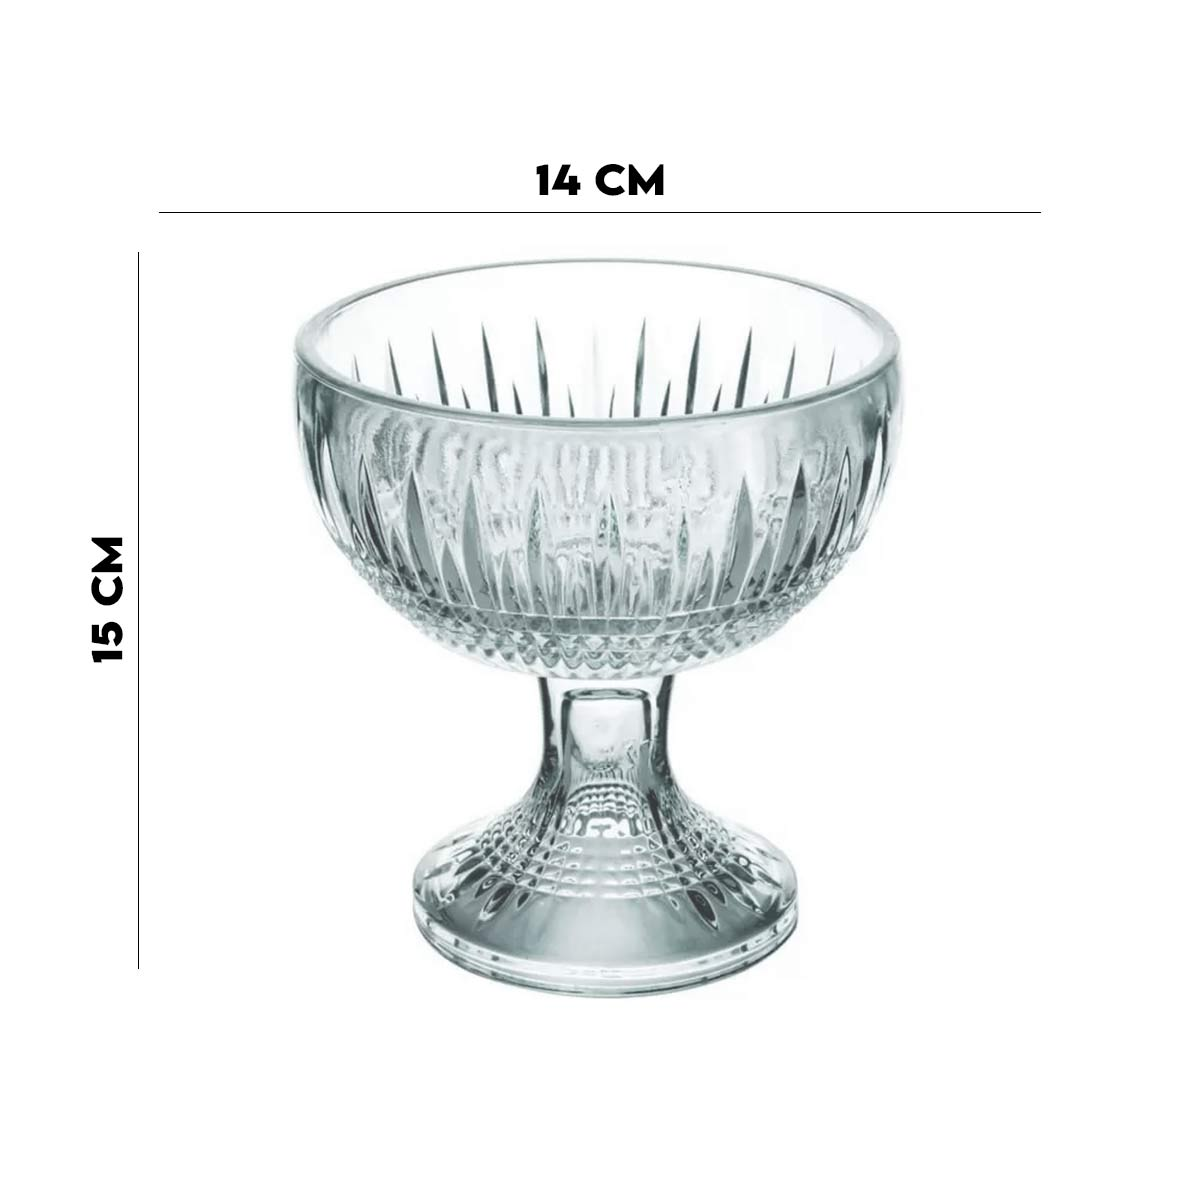 Centro de Mesa 15x14x14  Wollf Cristal de Chumbo Quenn Verde  - Lemis